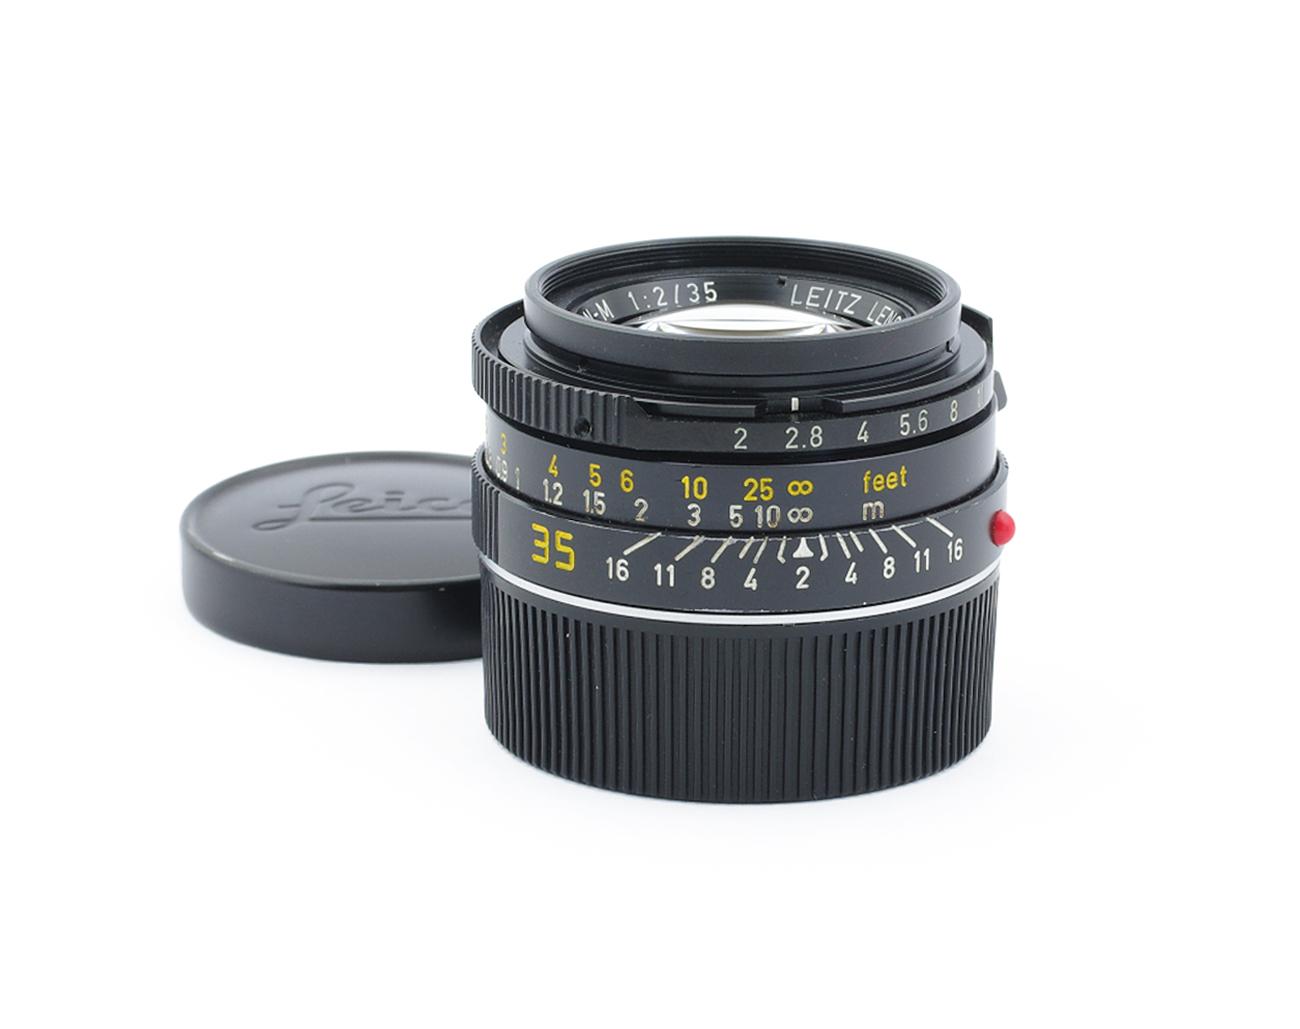 Leica-M-Summicron-2-35-mm-3061350-Canada-Lens-6-bit